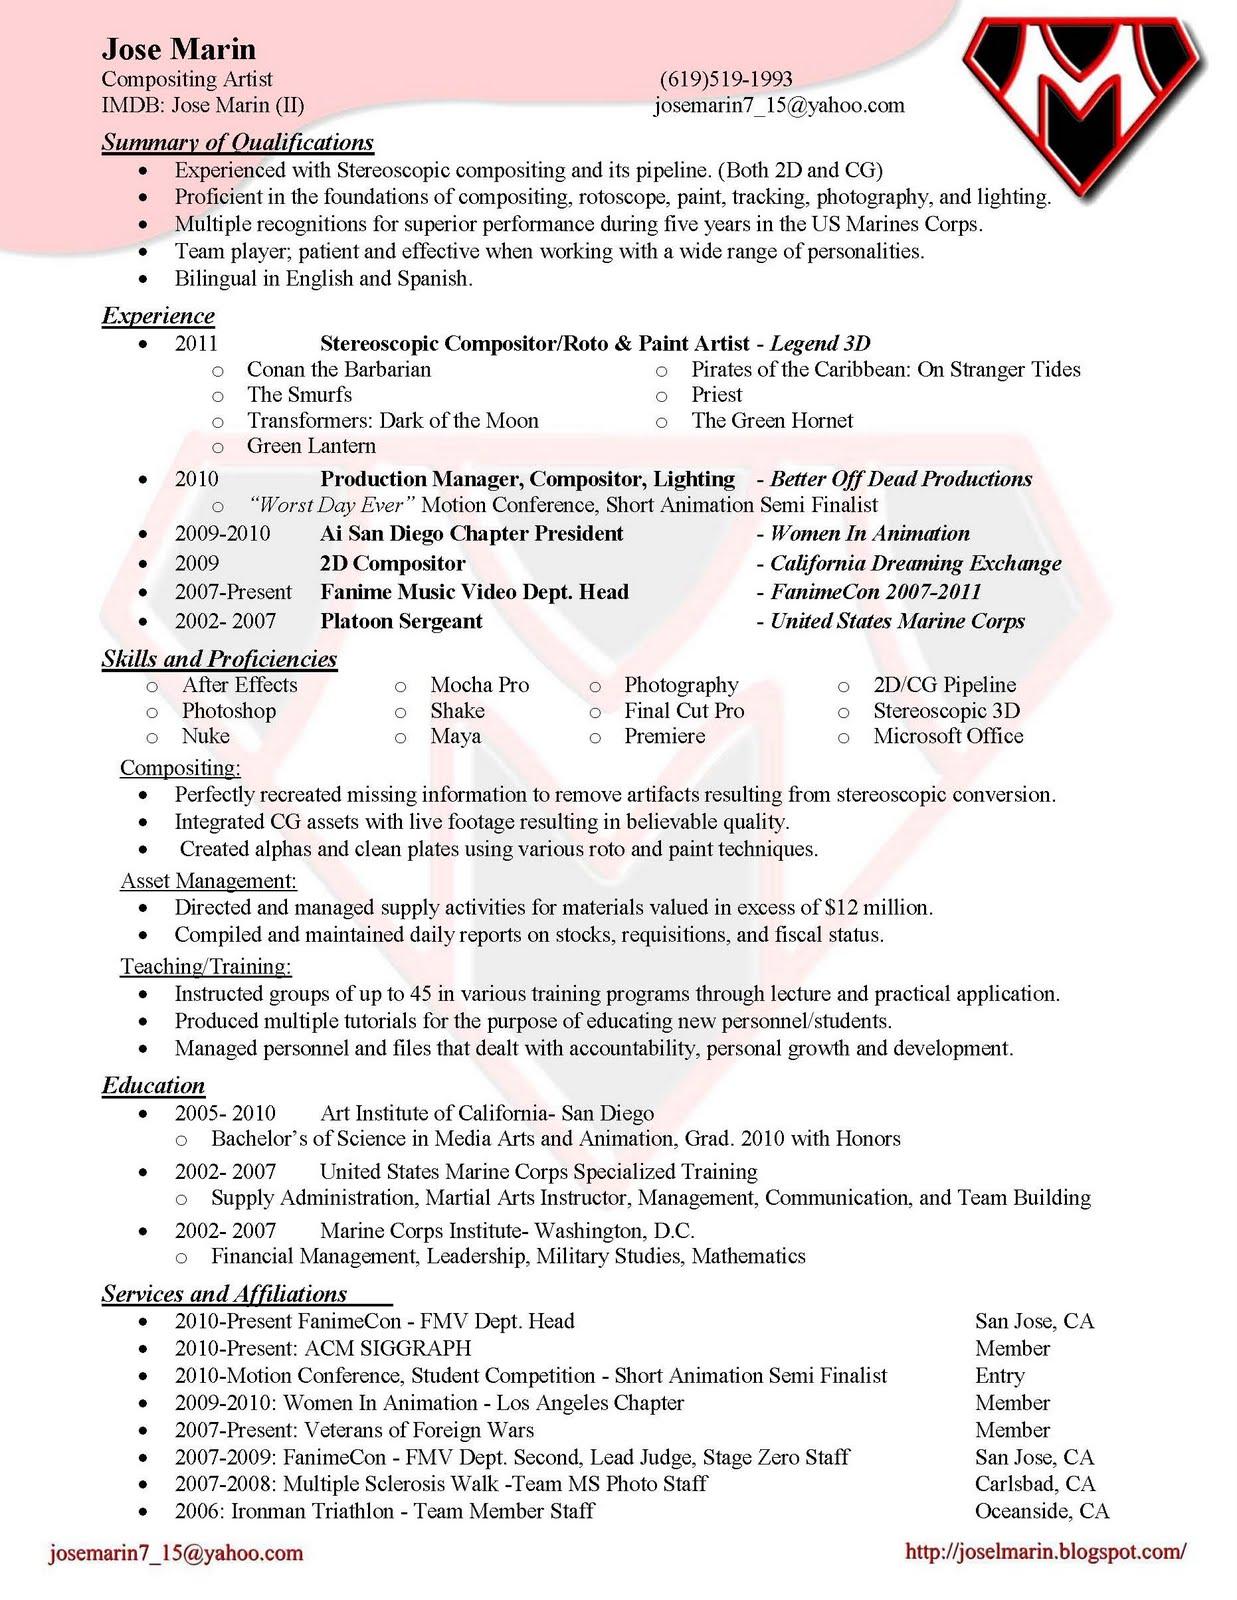 Jose Marin Compositing Resume